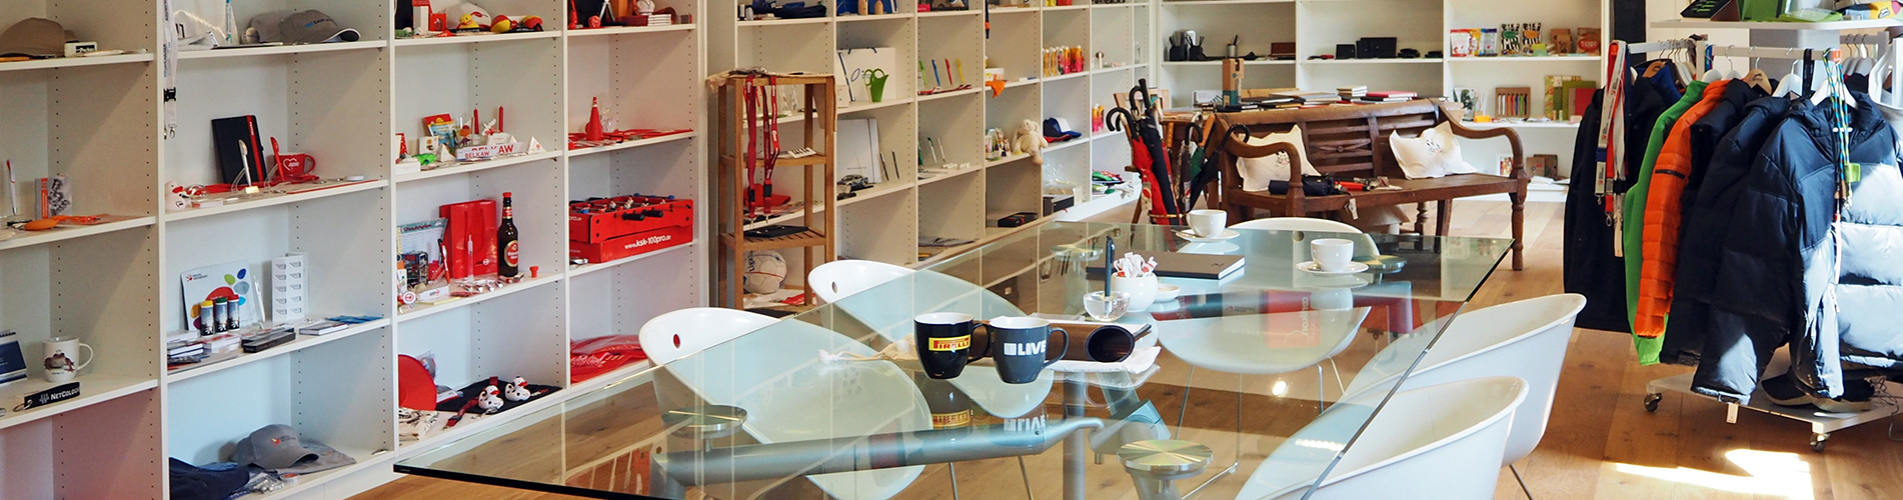 Showroom SLG Werbeartikel Promotion GmbH